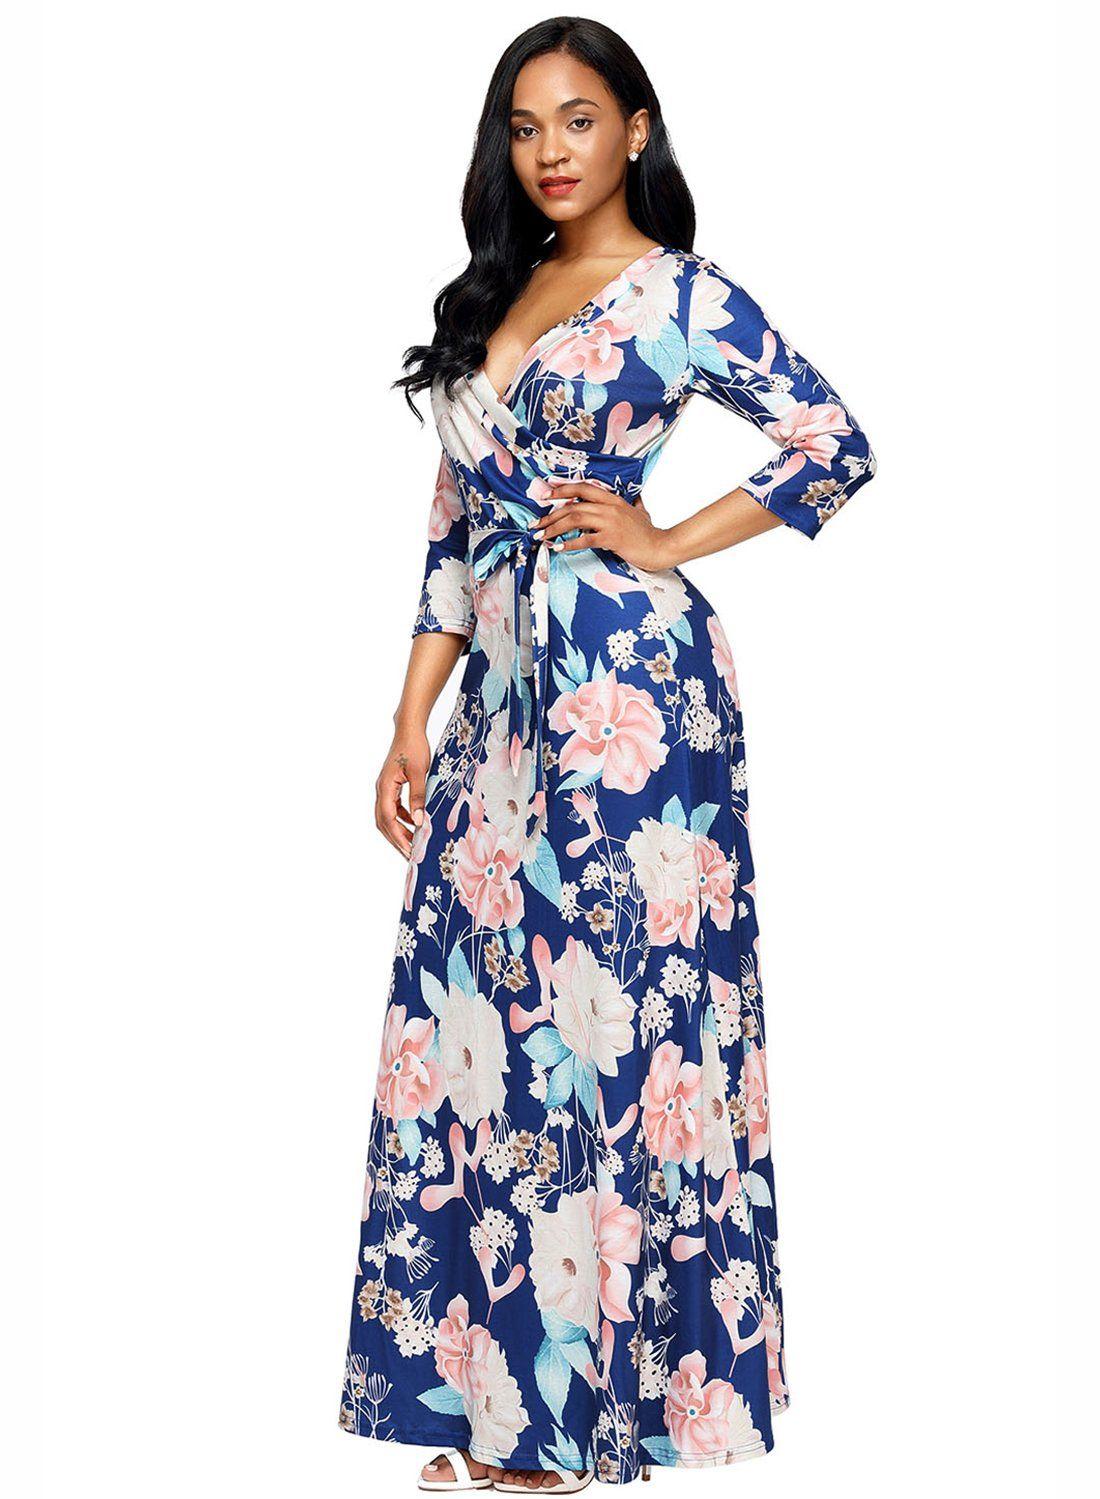 Womens casual floral maxi dress long sleeveswrap v neck boho